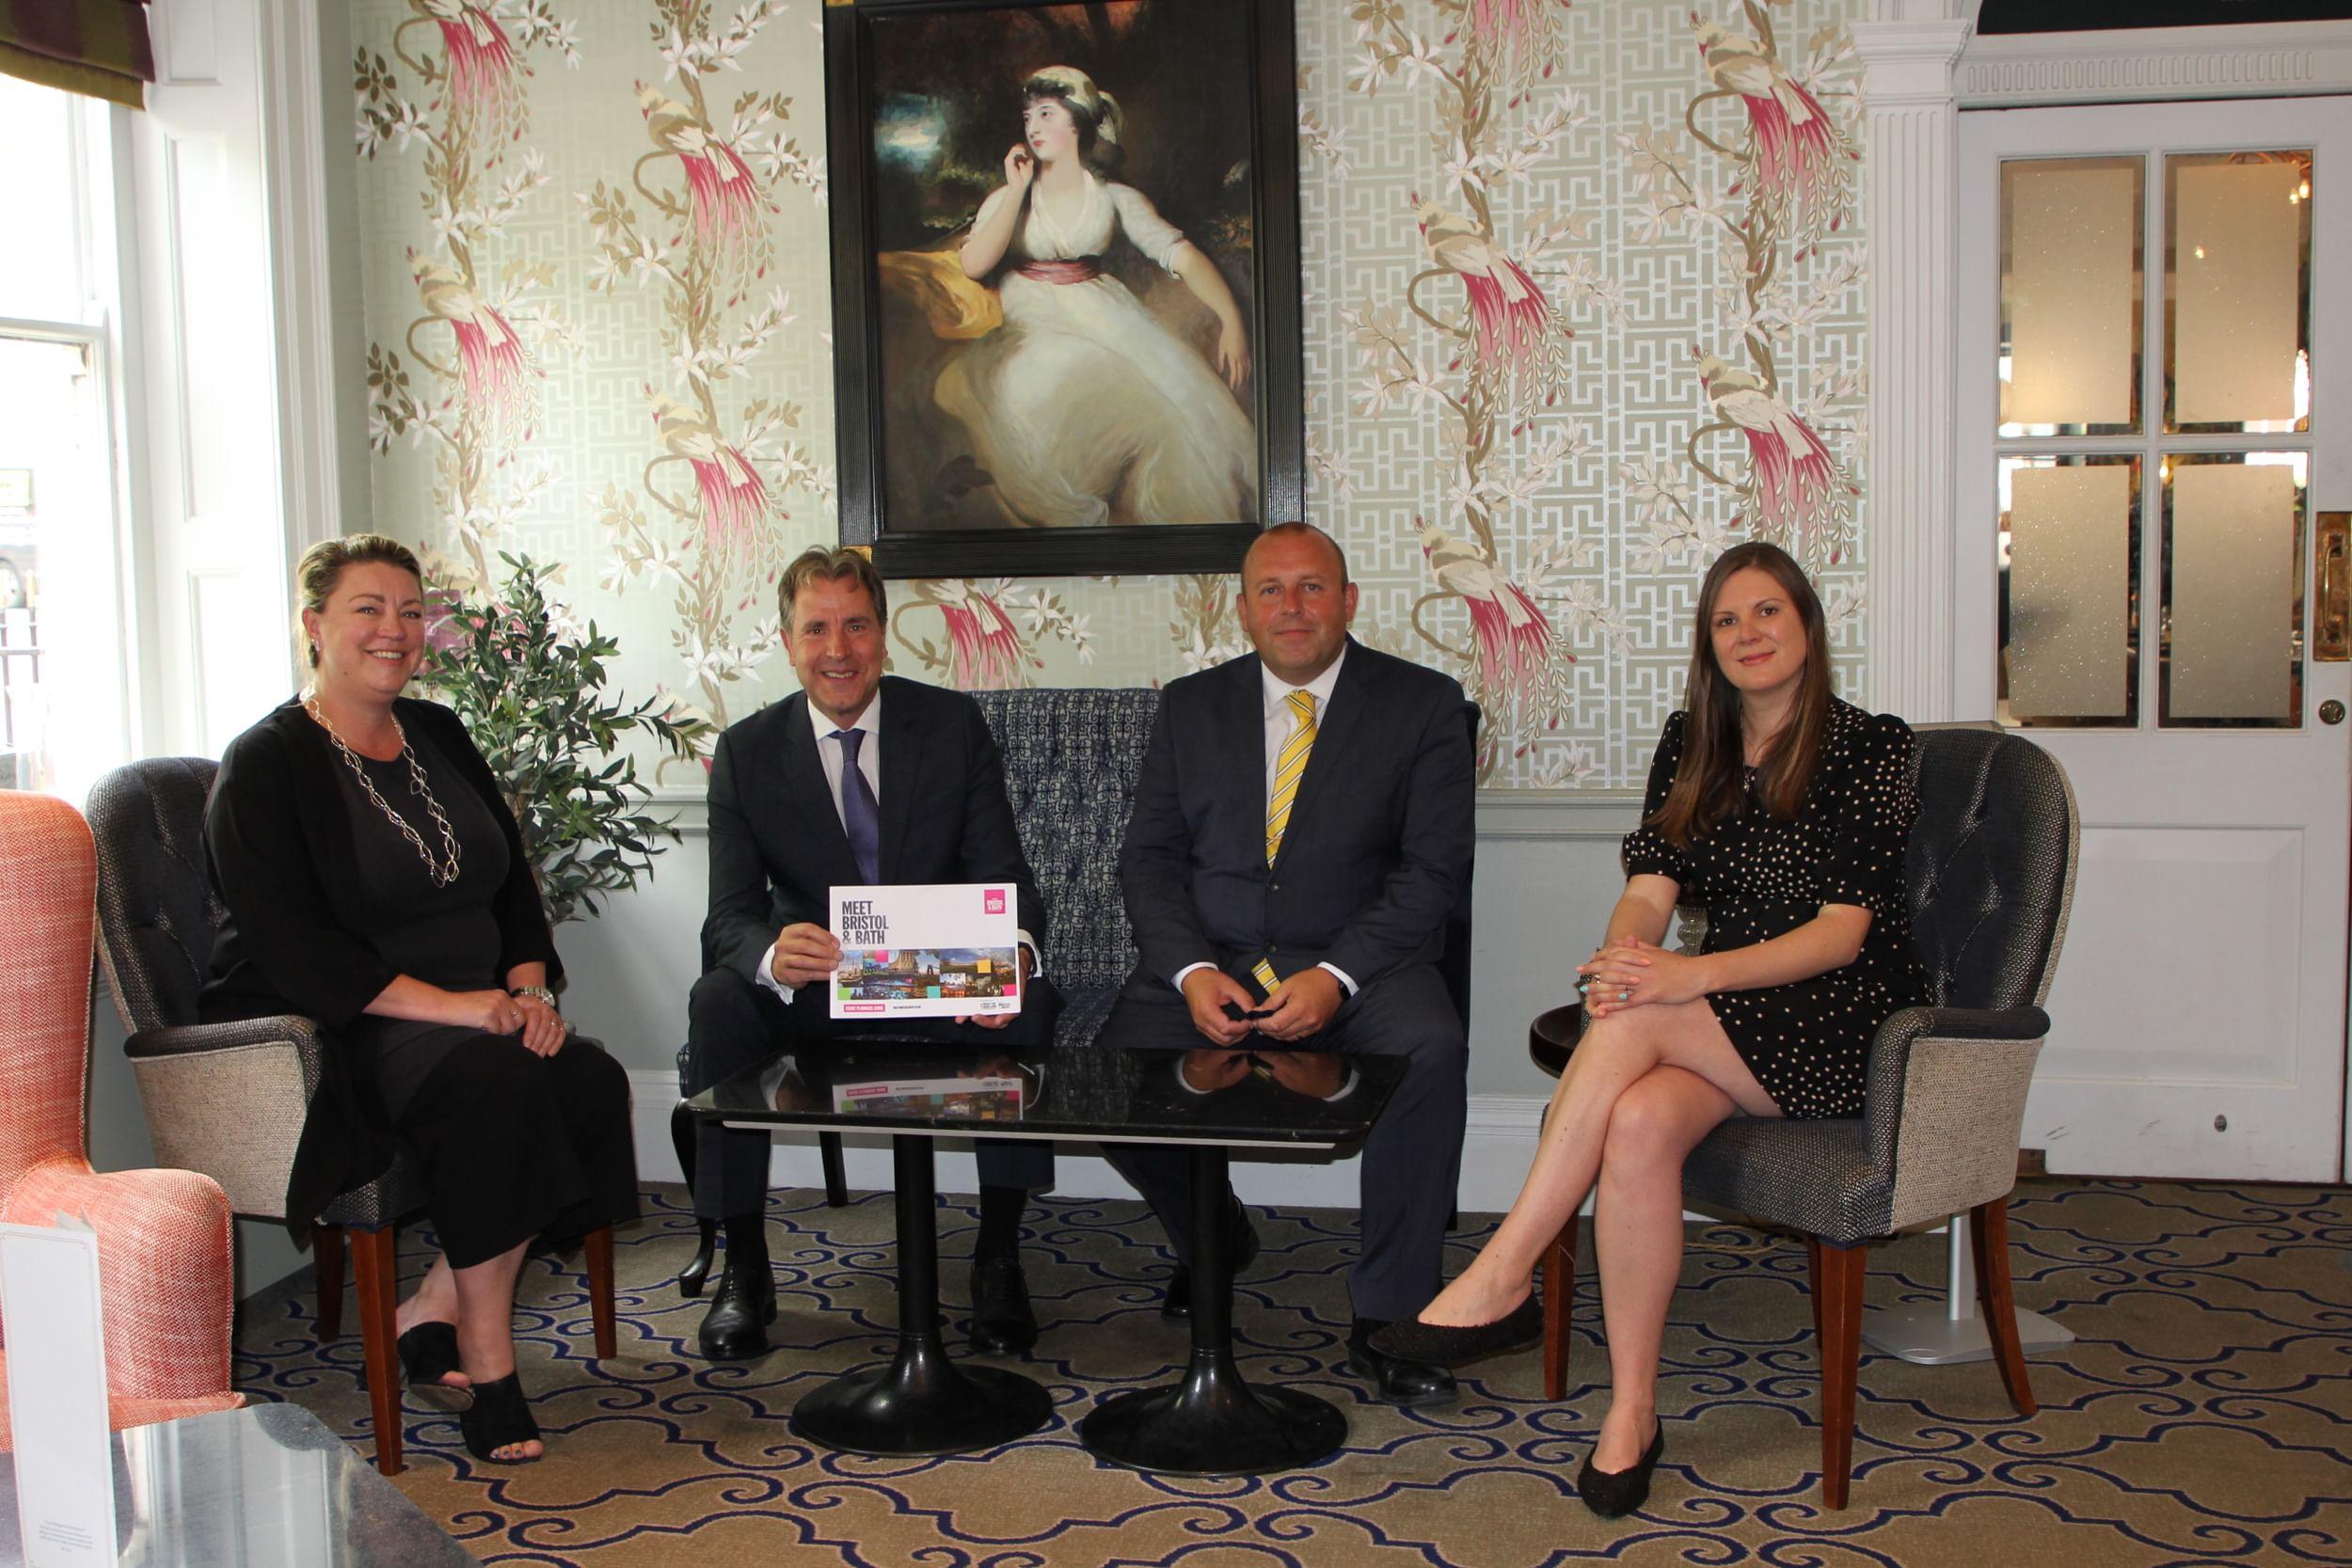 Meet Bristol and Bath team with Metro Mayor Dan Norris